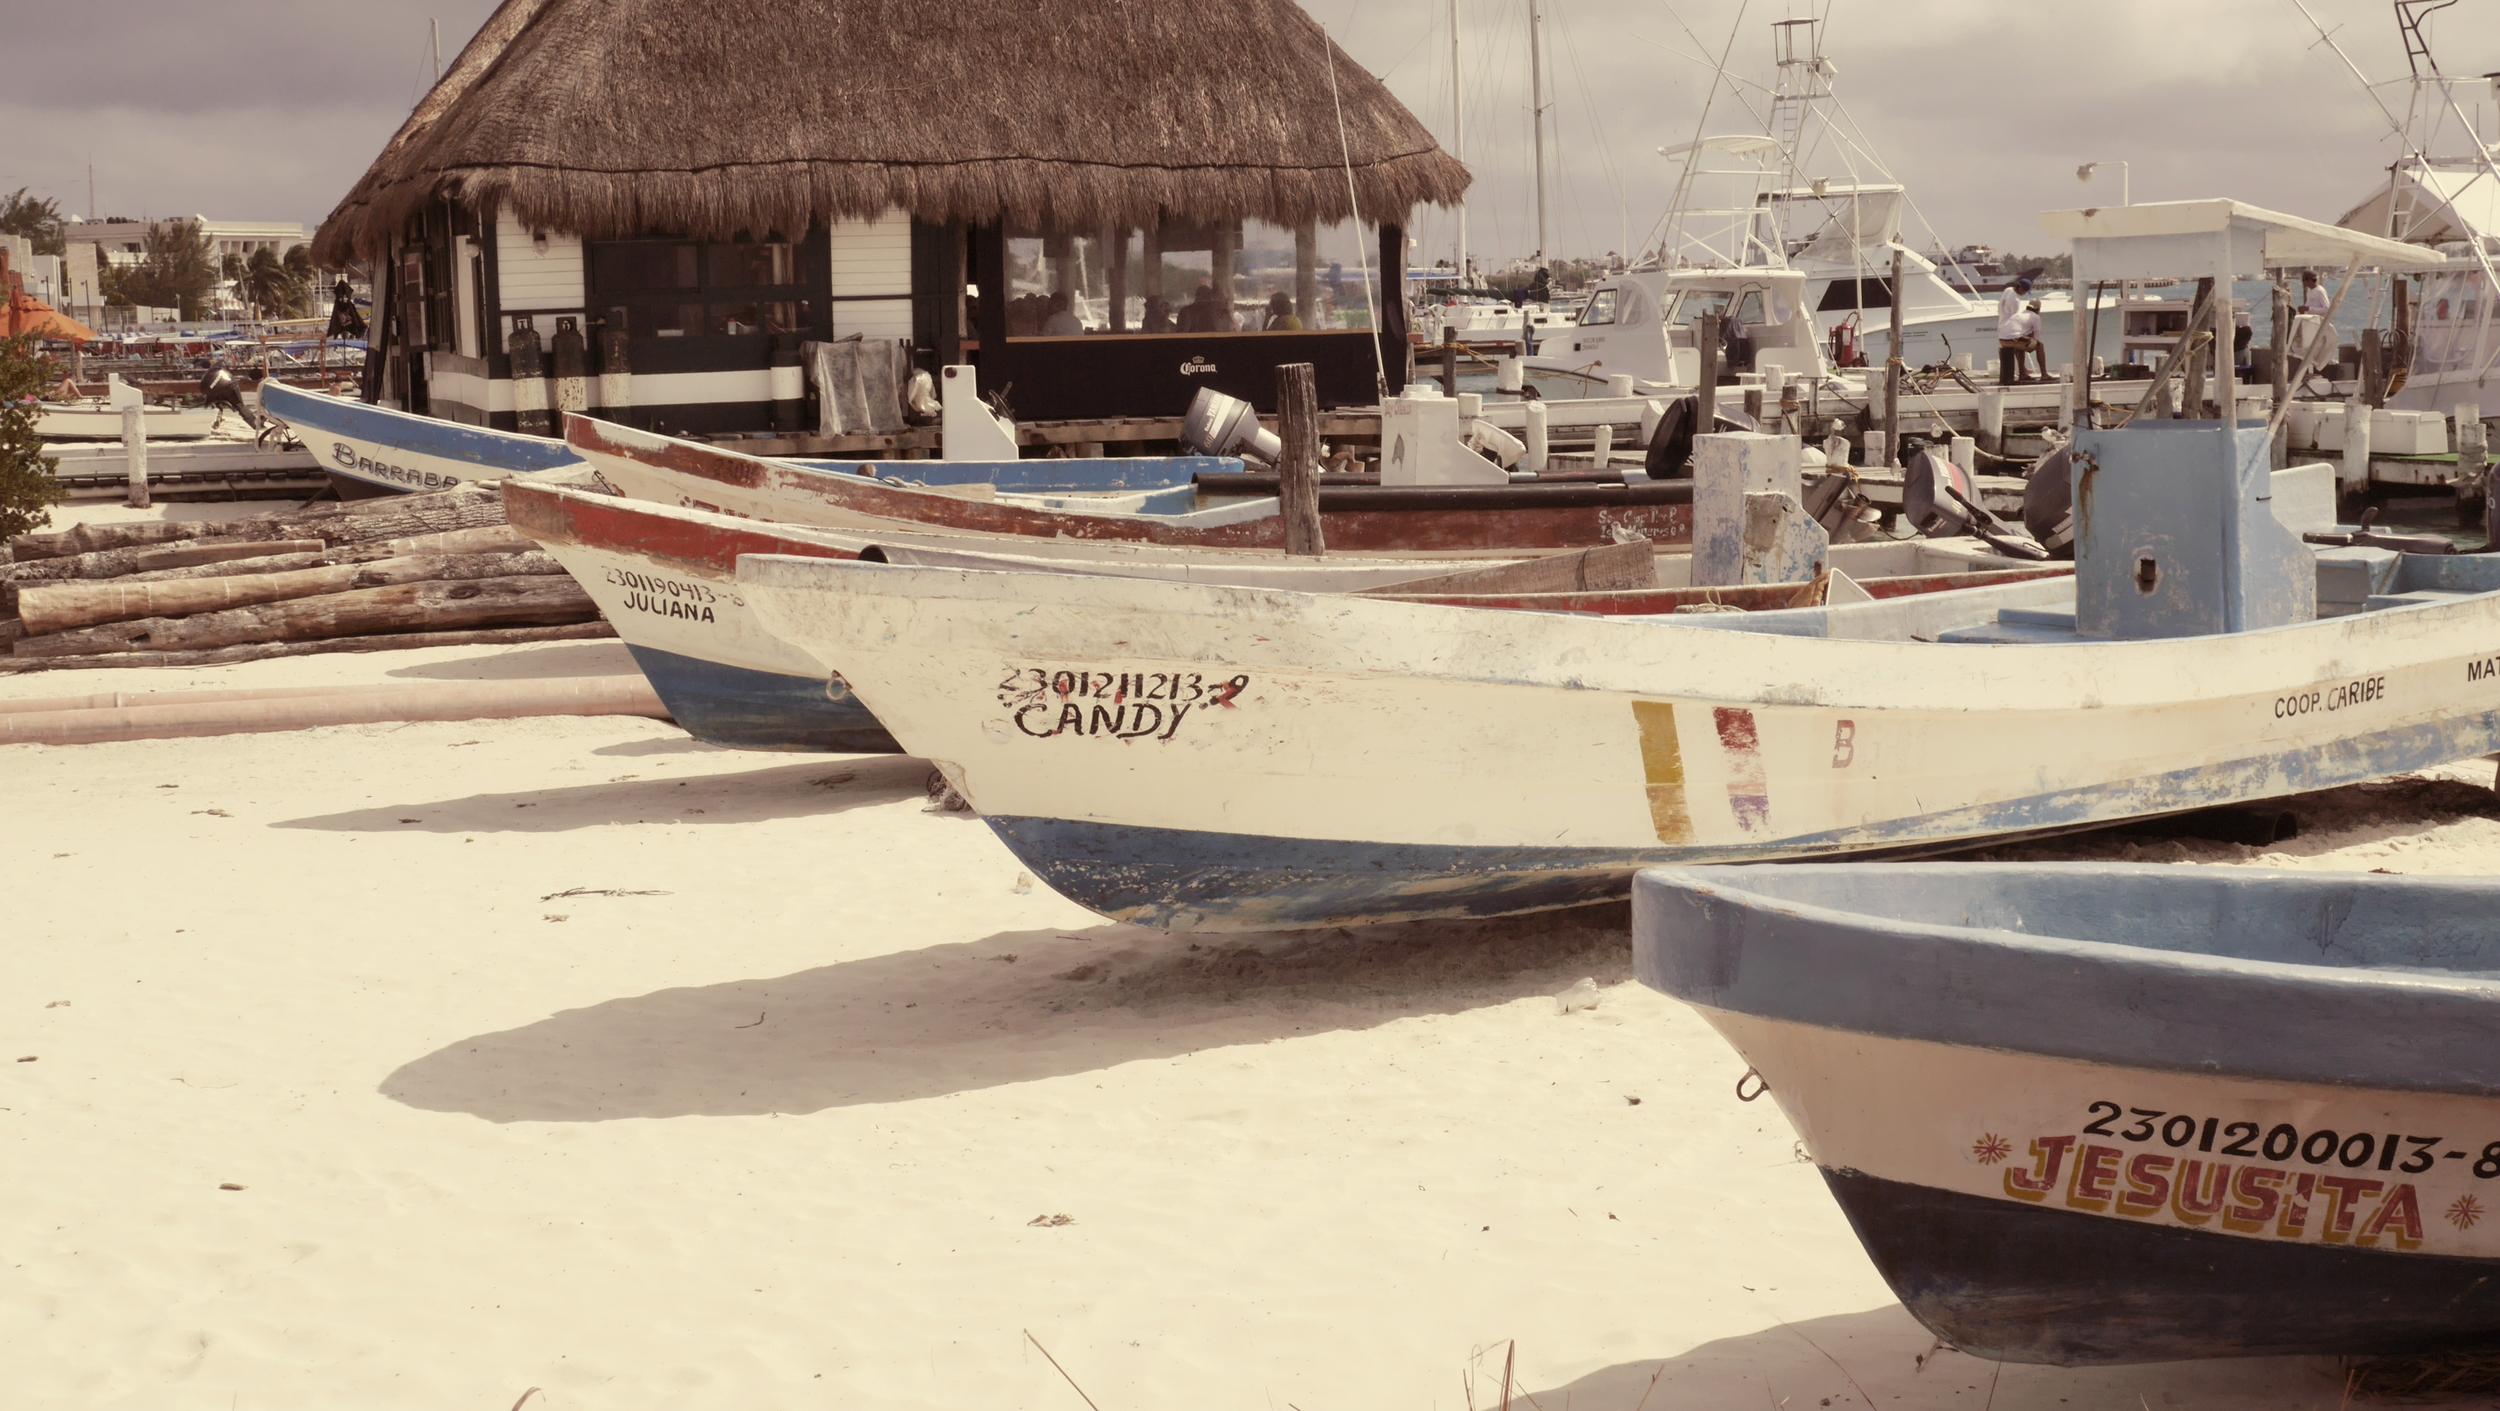 Fishing Boats on Isla Mujeres  | Trillium Caterers, Belfast, Maine